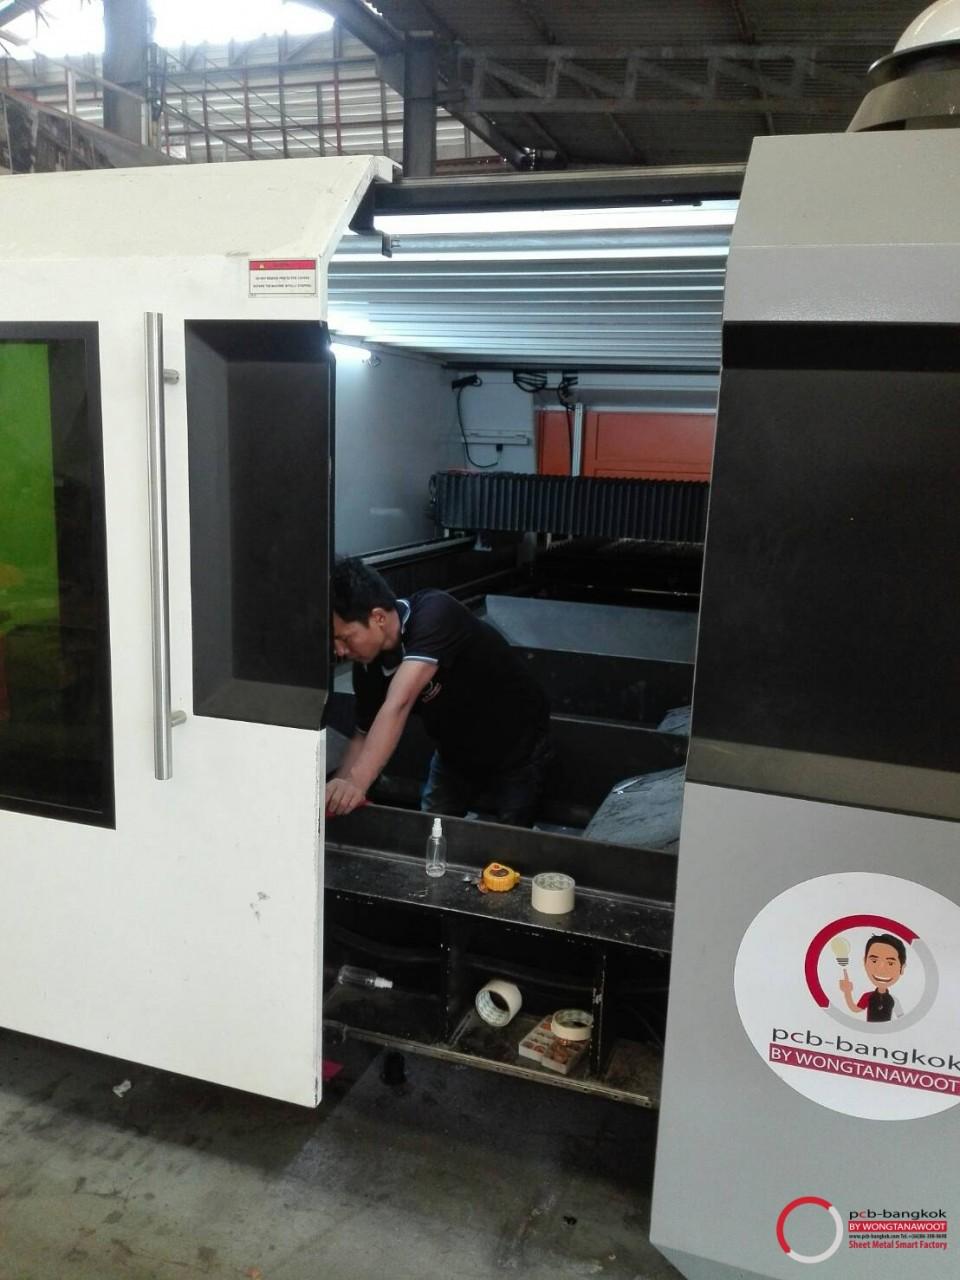 Wongtanawoot___fiber-laser-cutting_ermaksan_4